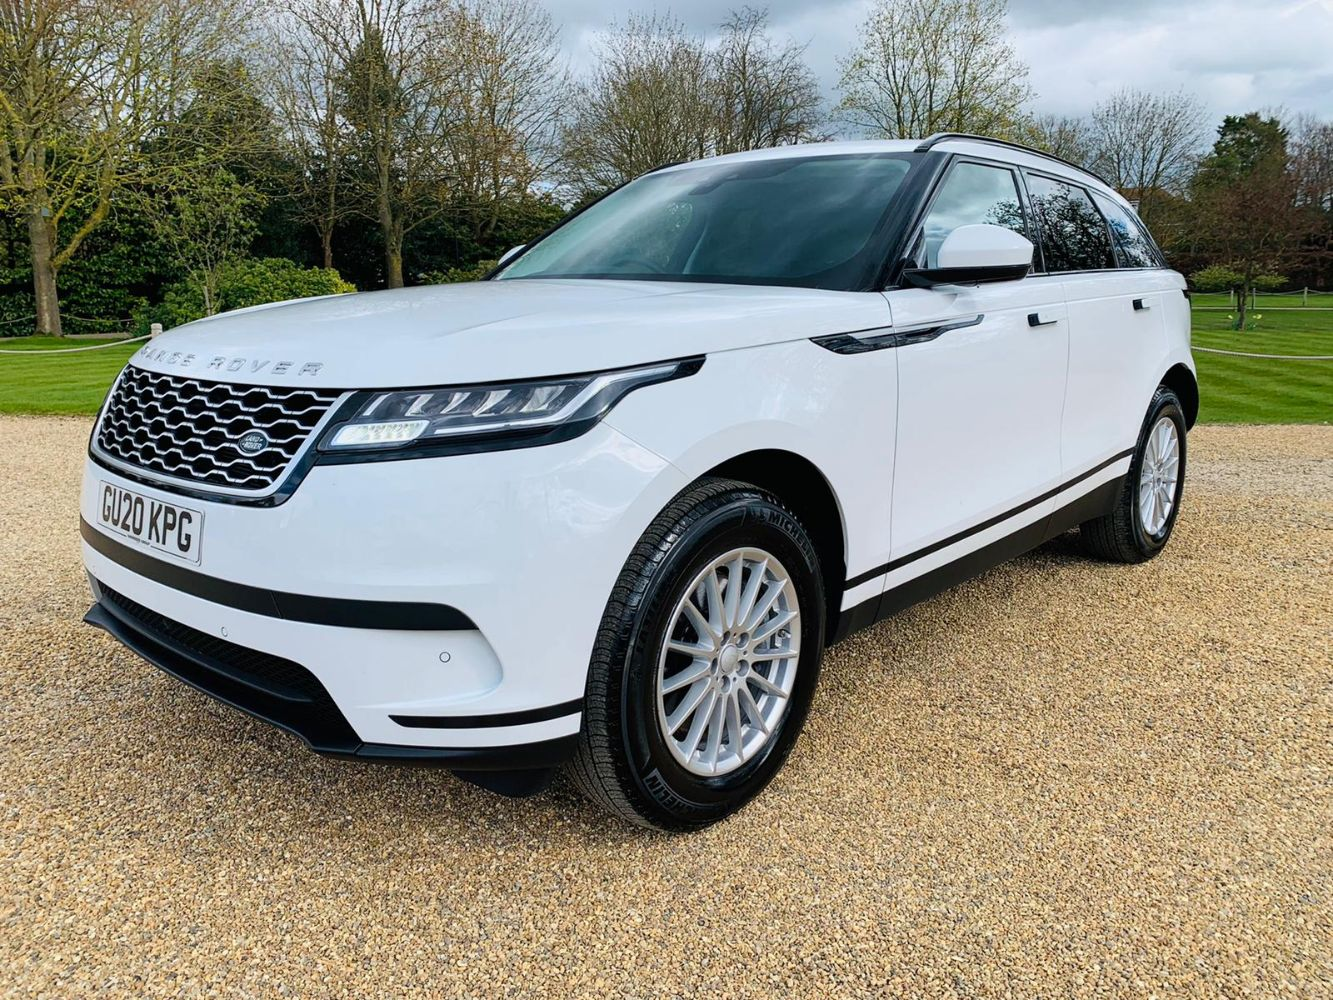 Range Rover Velar D300 (296 BHP) 2020 20 Reg (White) - BMW X1 18d sDrive 2018 Reg - Fleet Vehicle Disposal